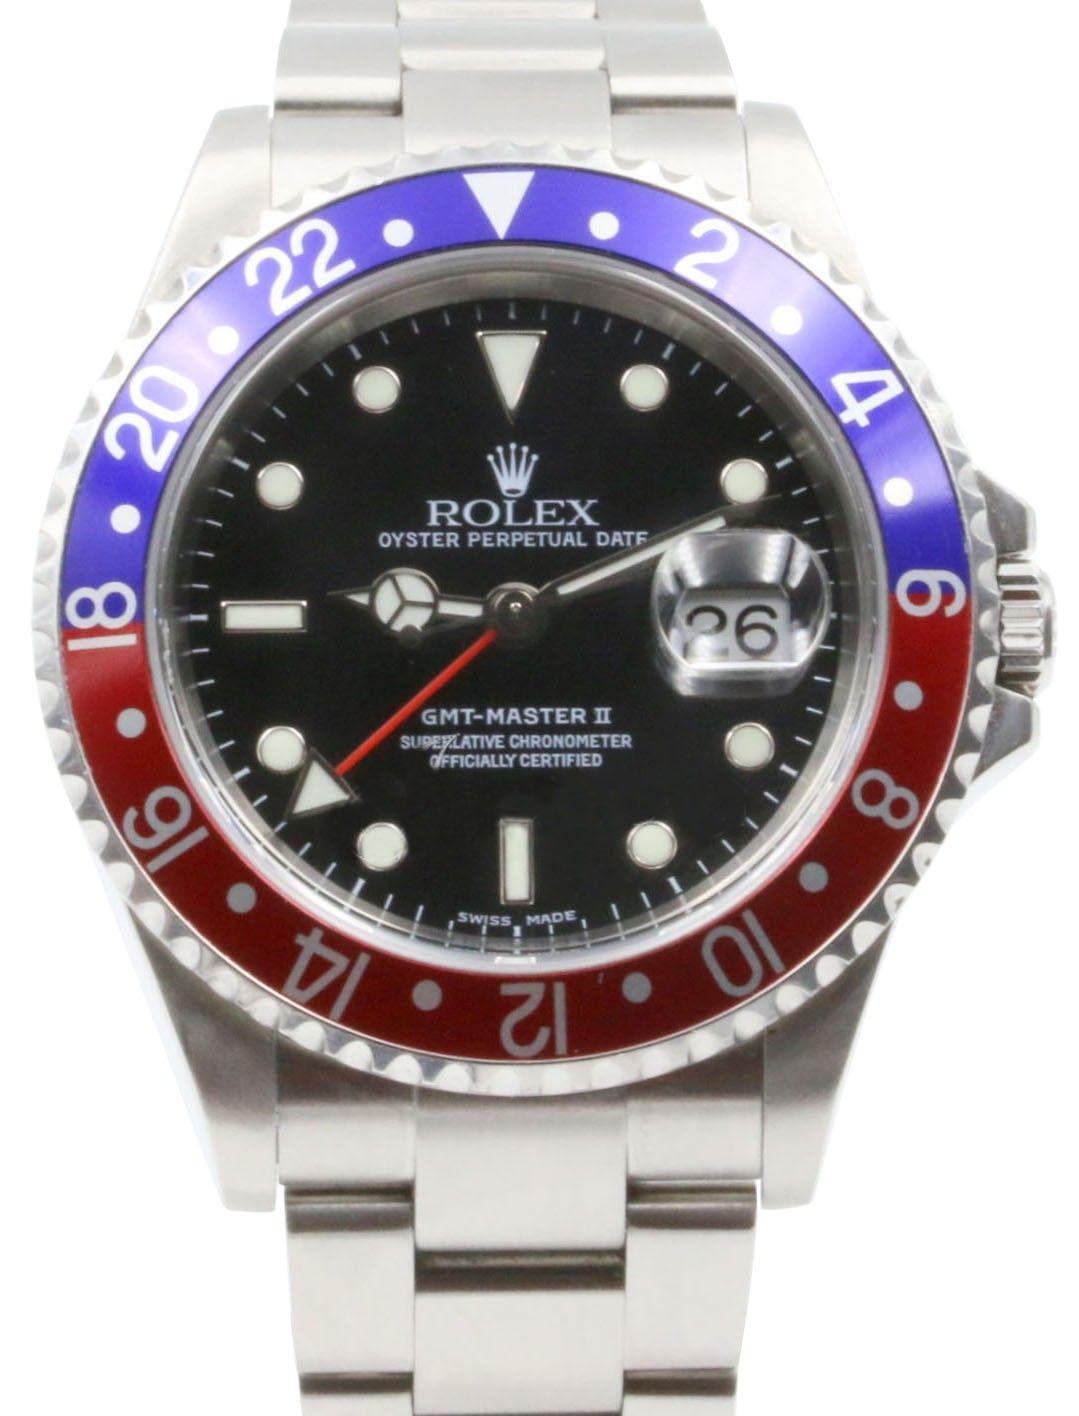 Rolex Gmt Master Ii Stainless Steel 40mm Pepsi Blue Red Bezel Black Oyster Bracelet No Holes 16710 Pre Owned Rolex Rolex Gmt Master Ii Rolex Gmt Master